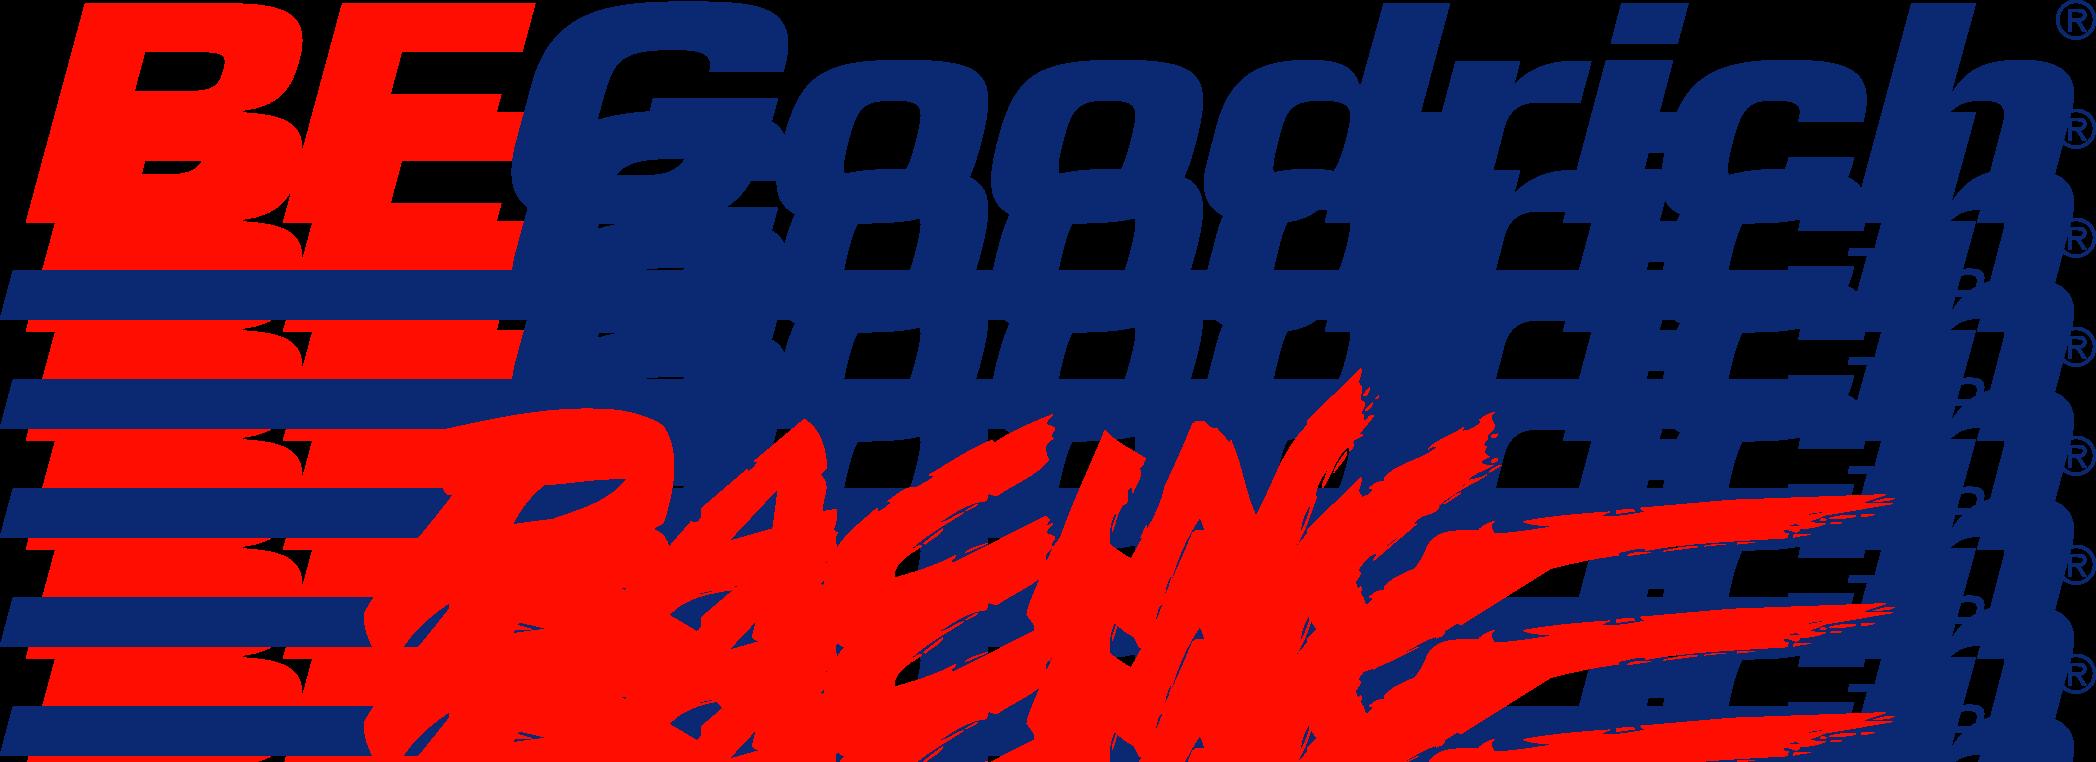 BFG racing